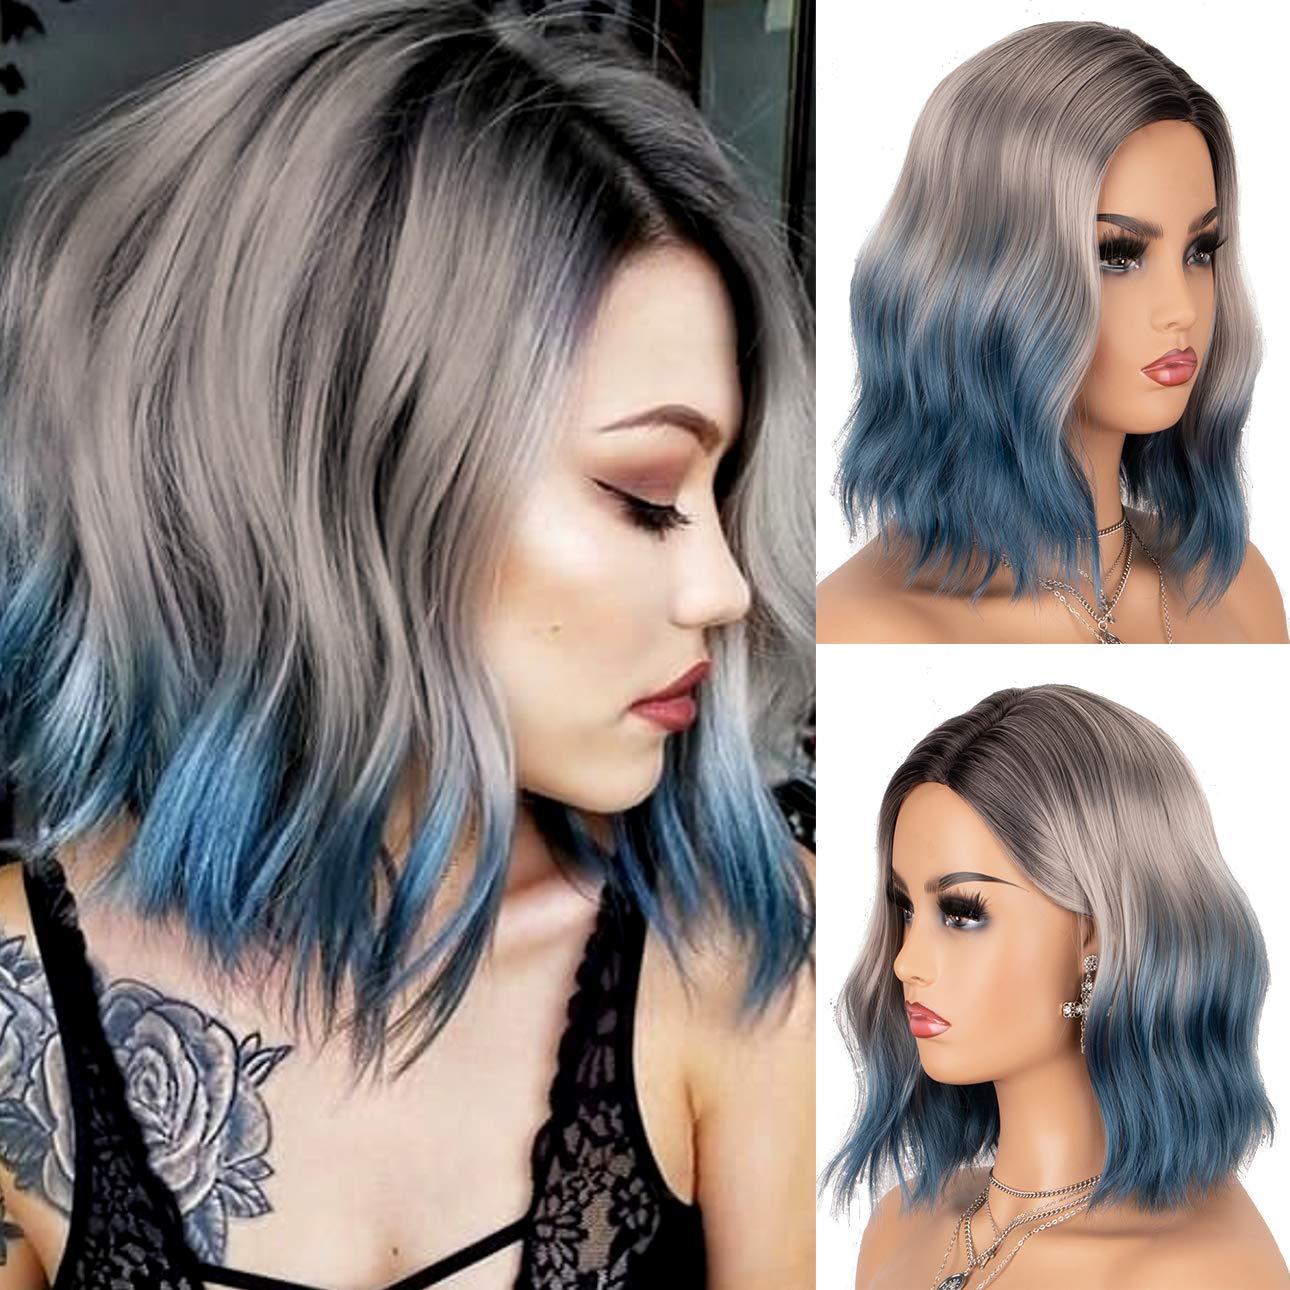 K'ryssma Blue Ombre Wig Bob with Dark Root 3 Tone Short Wavy Synthetic Wigs Glueless Heat Resistant Hair